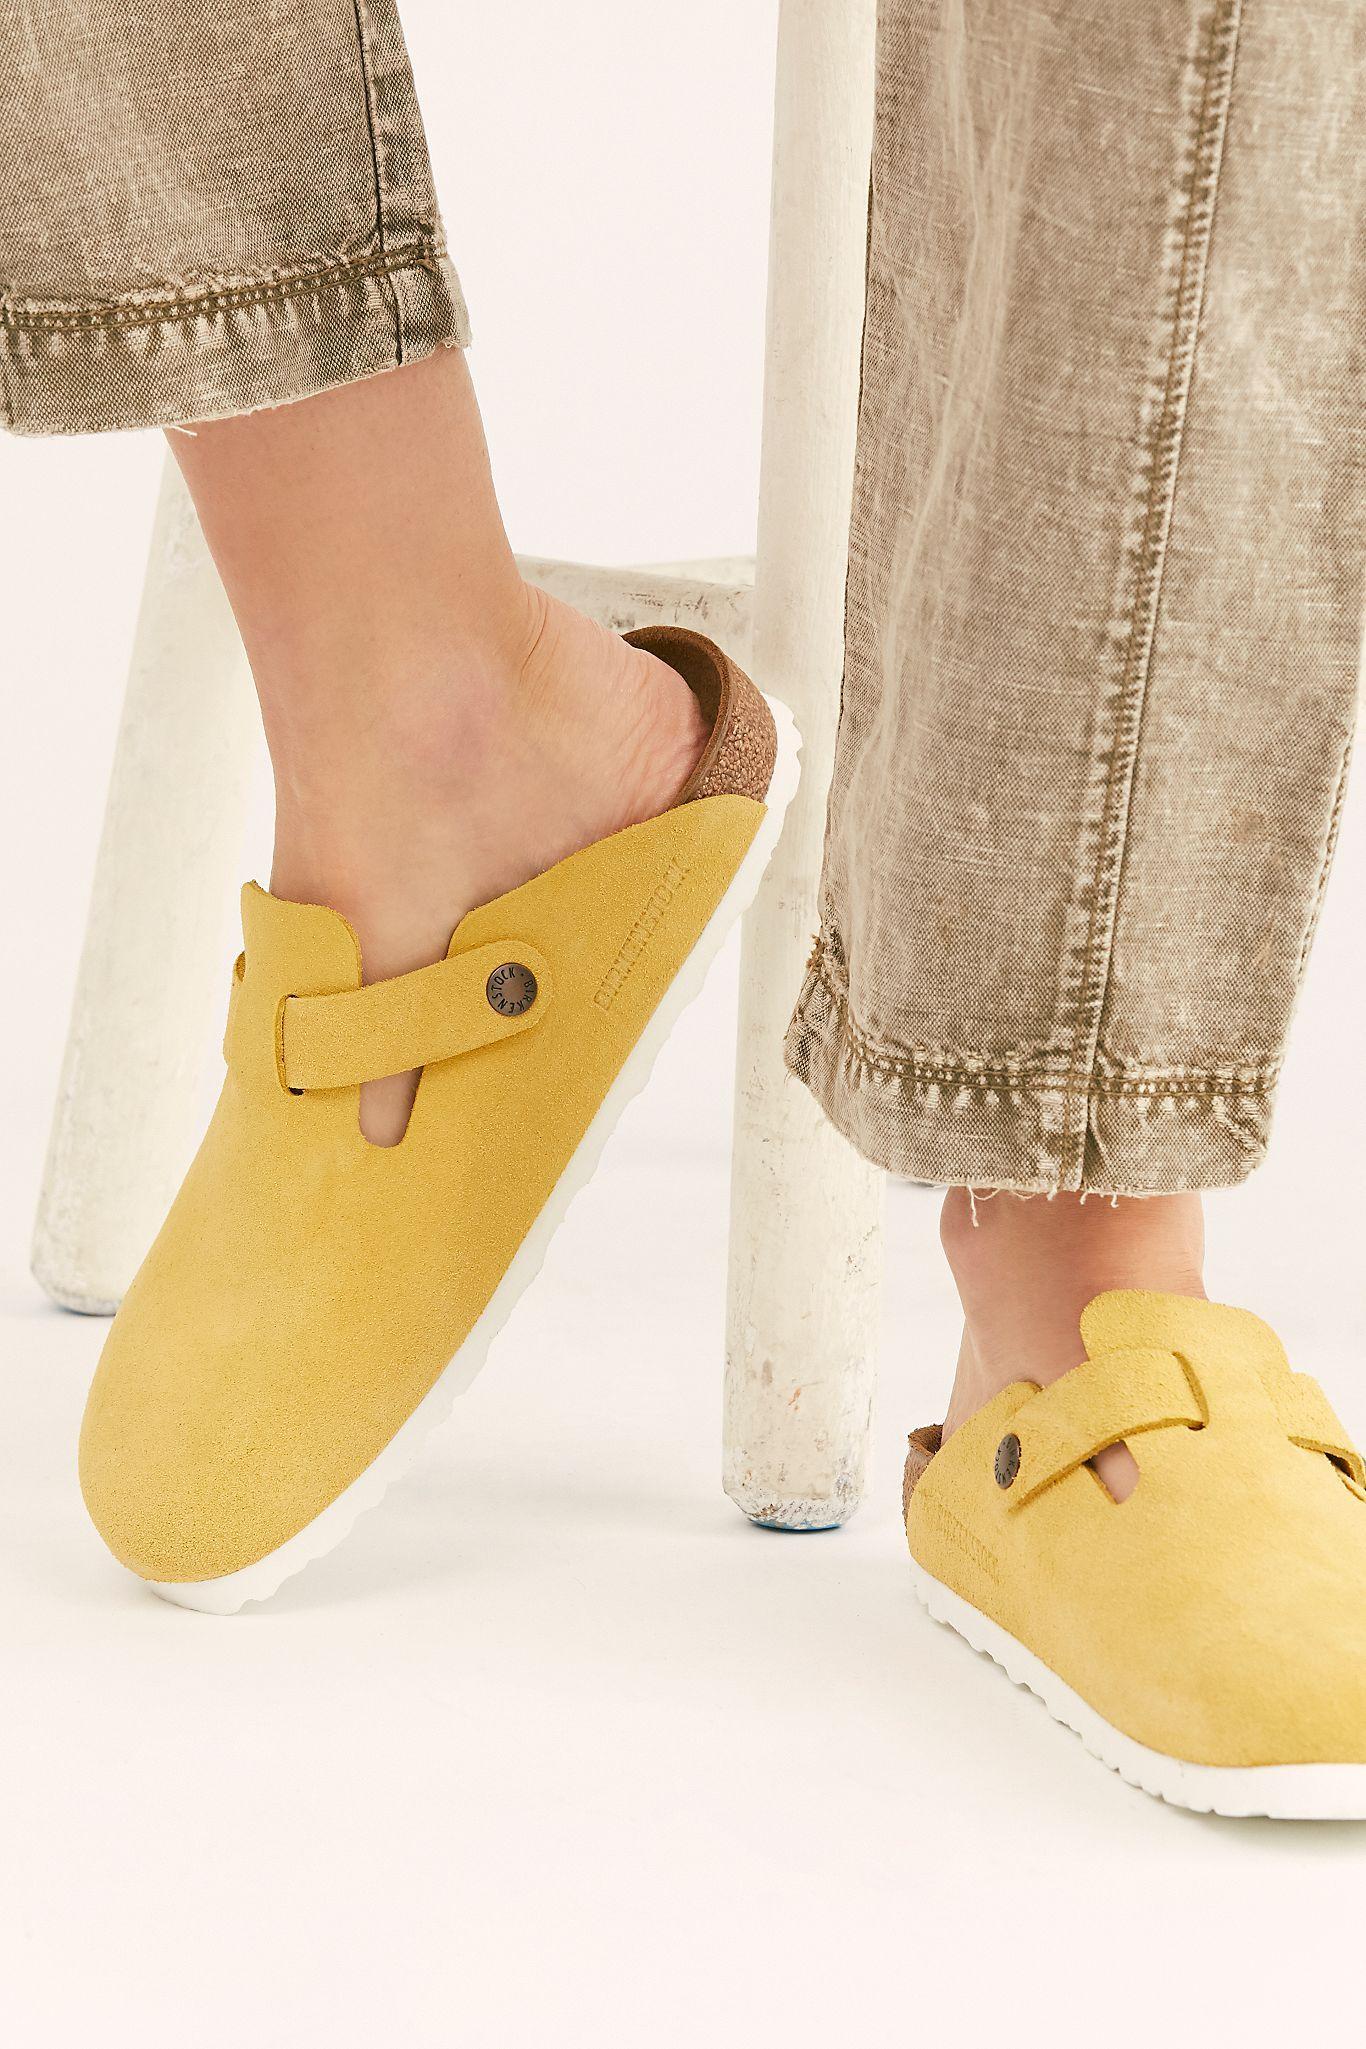 ShoesAll Shoes 243 Boston Birkenstock